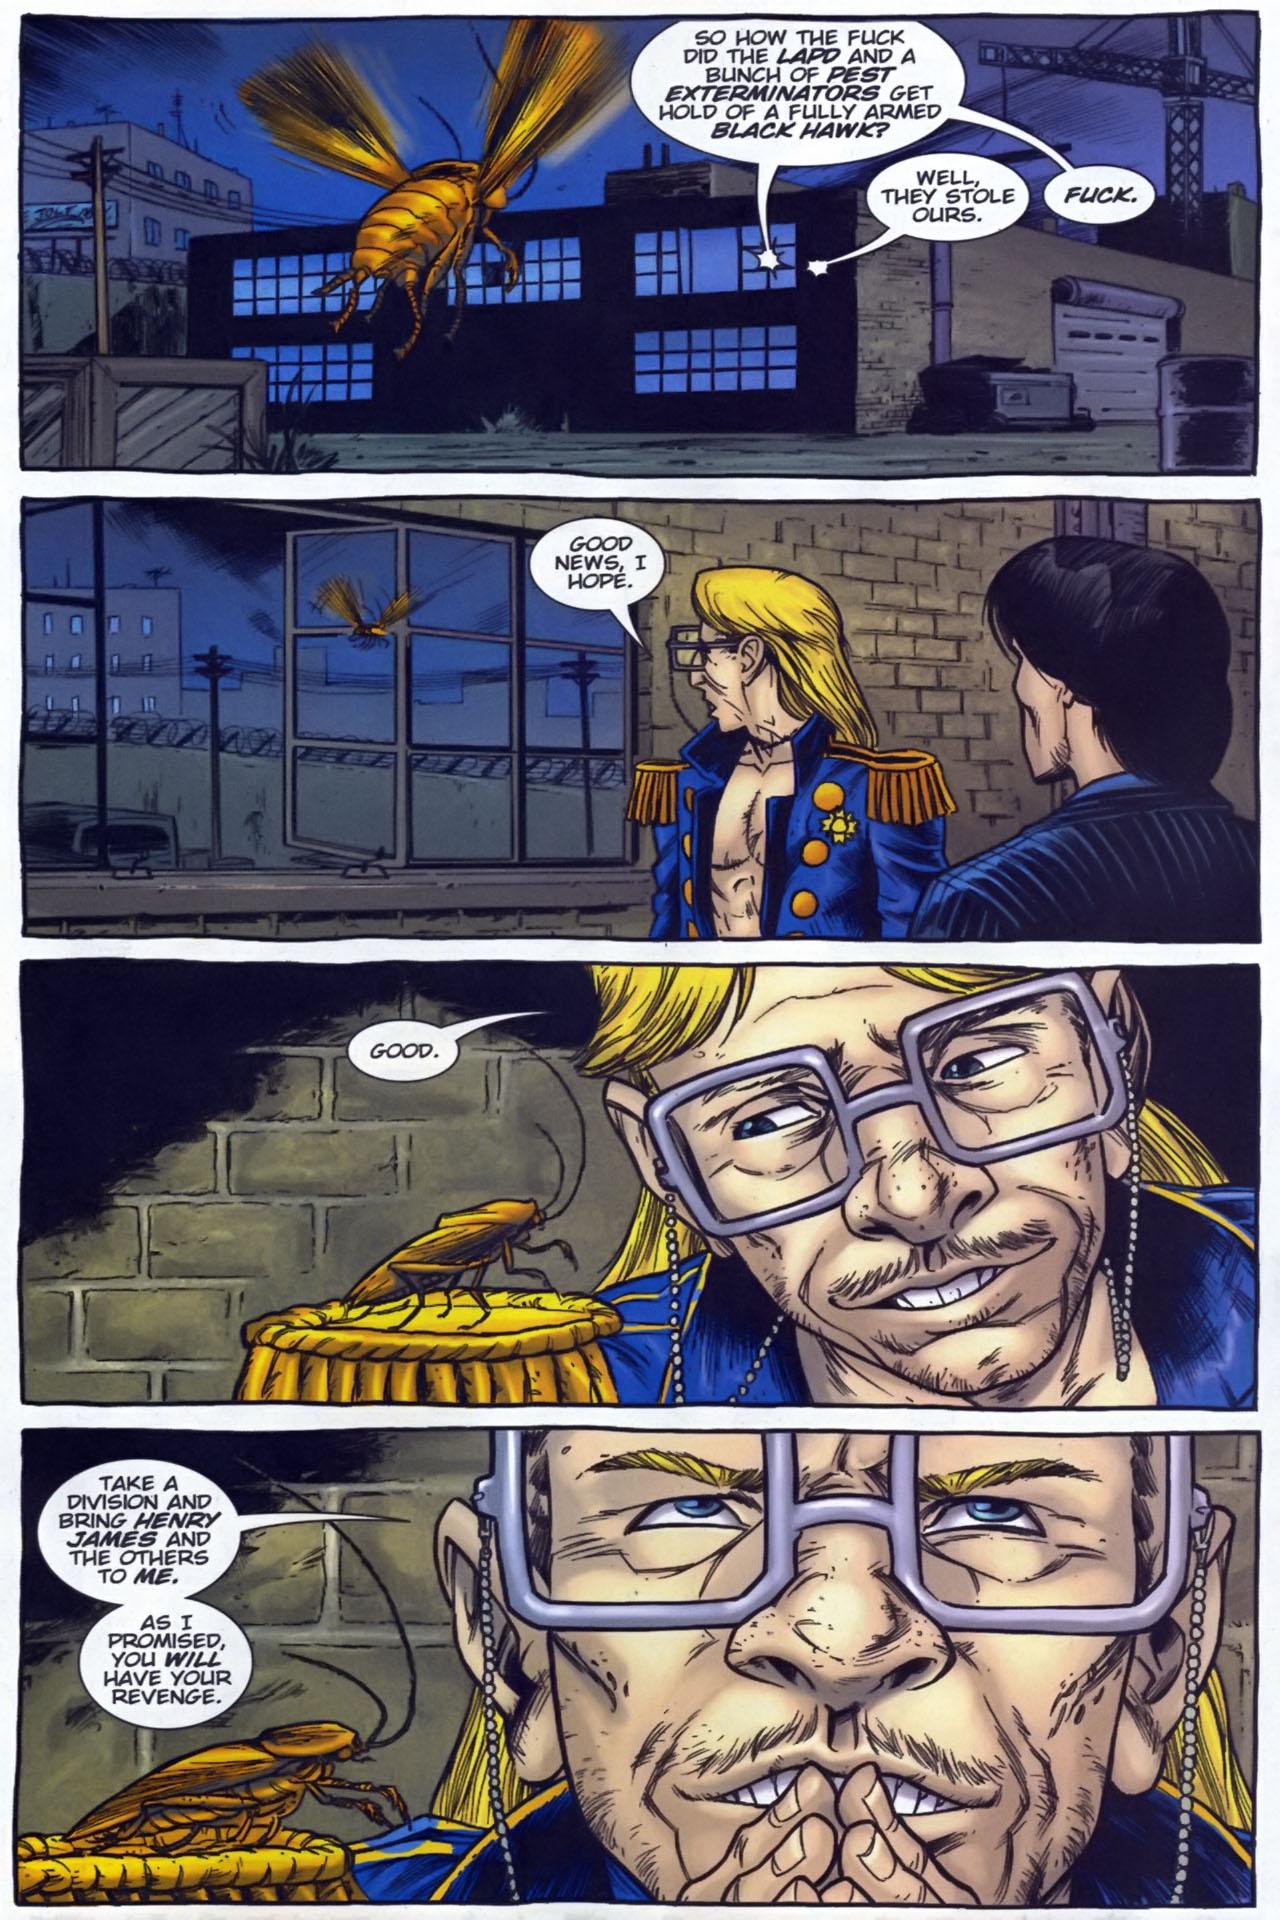 Read online The Exterminators comic -  Issue #29 - 22